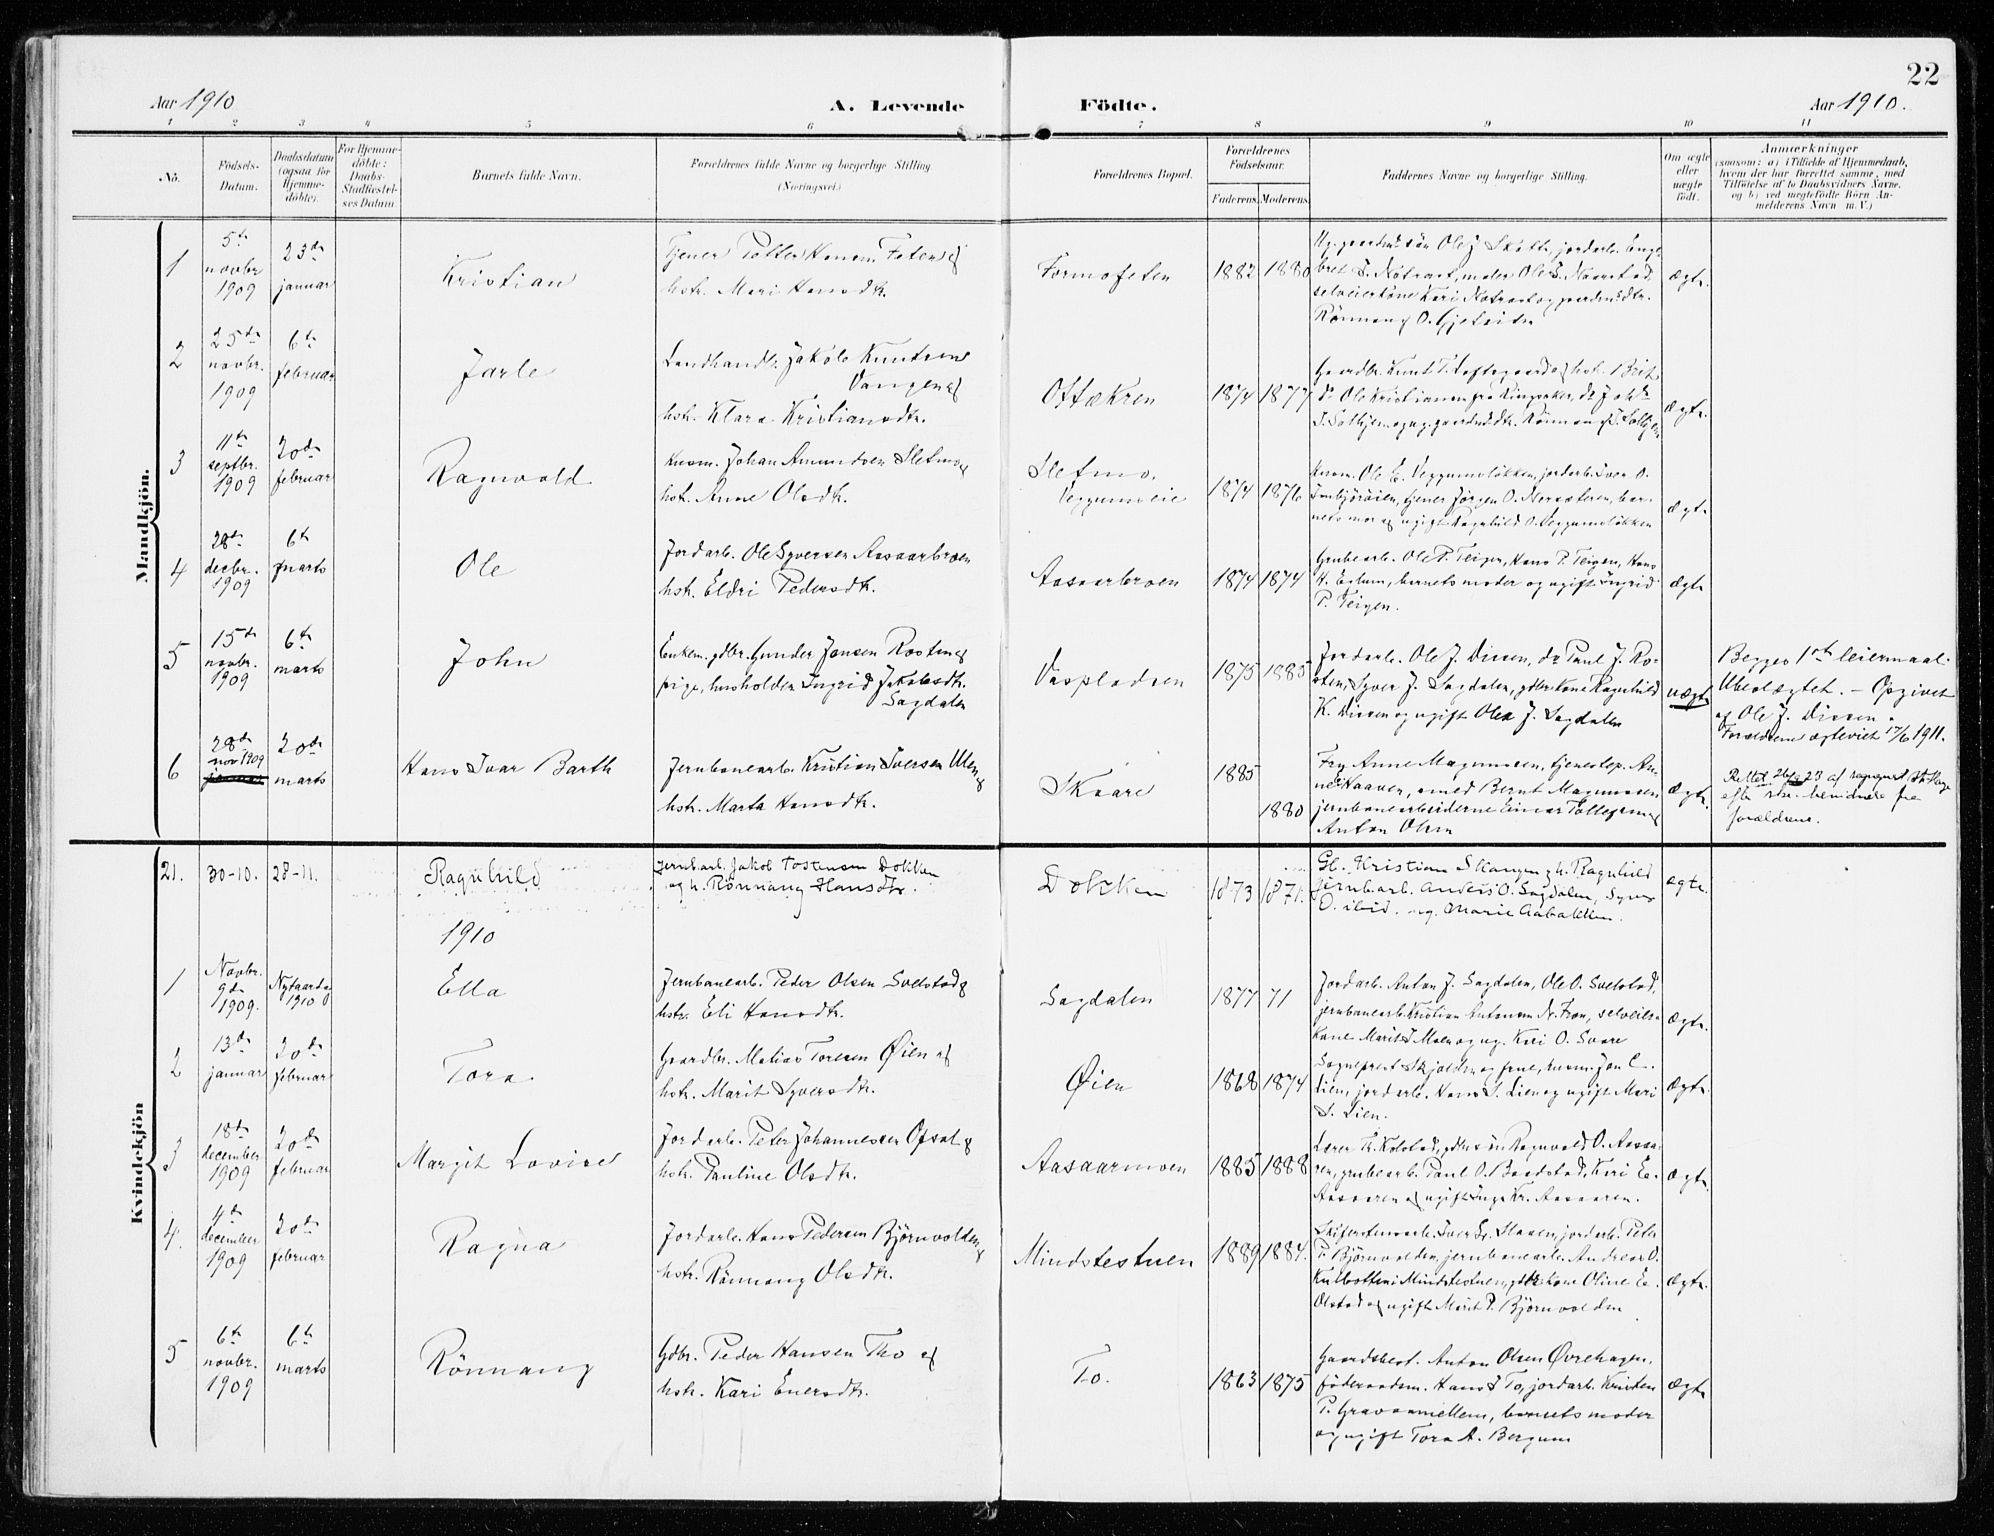 SAH, Sel prestekontor, Ministerialbok nr. 2, 1905-1919, s. 22